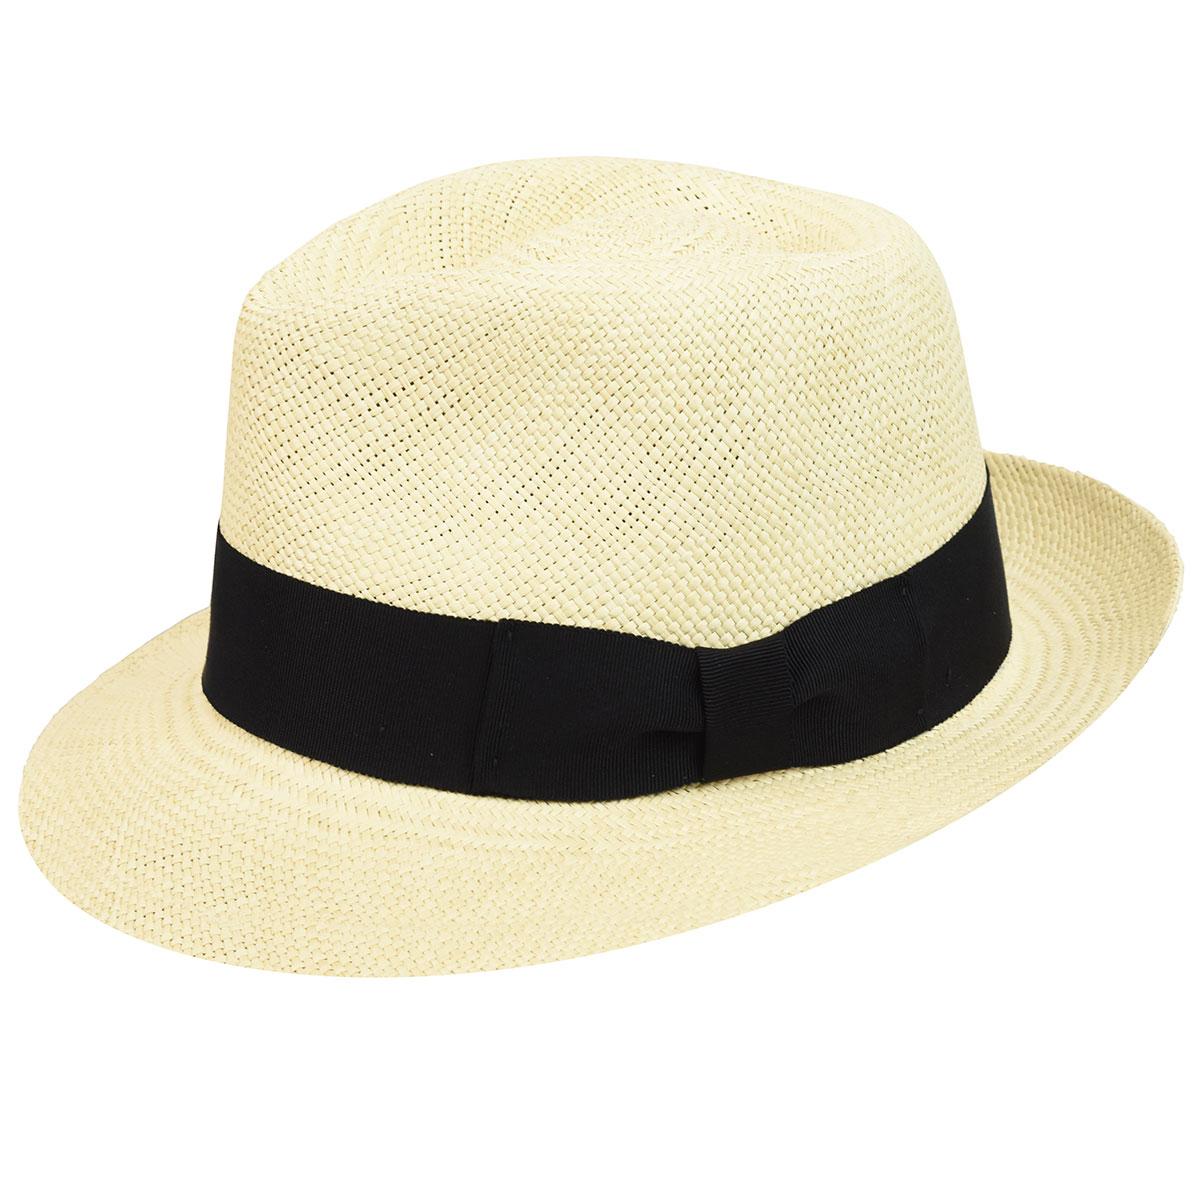 1940s Mens Hats | Fedora, Homburg, Pork Pie Hats Havana Panama Fedora $75.00 AT vintagedancer.com